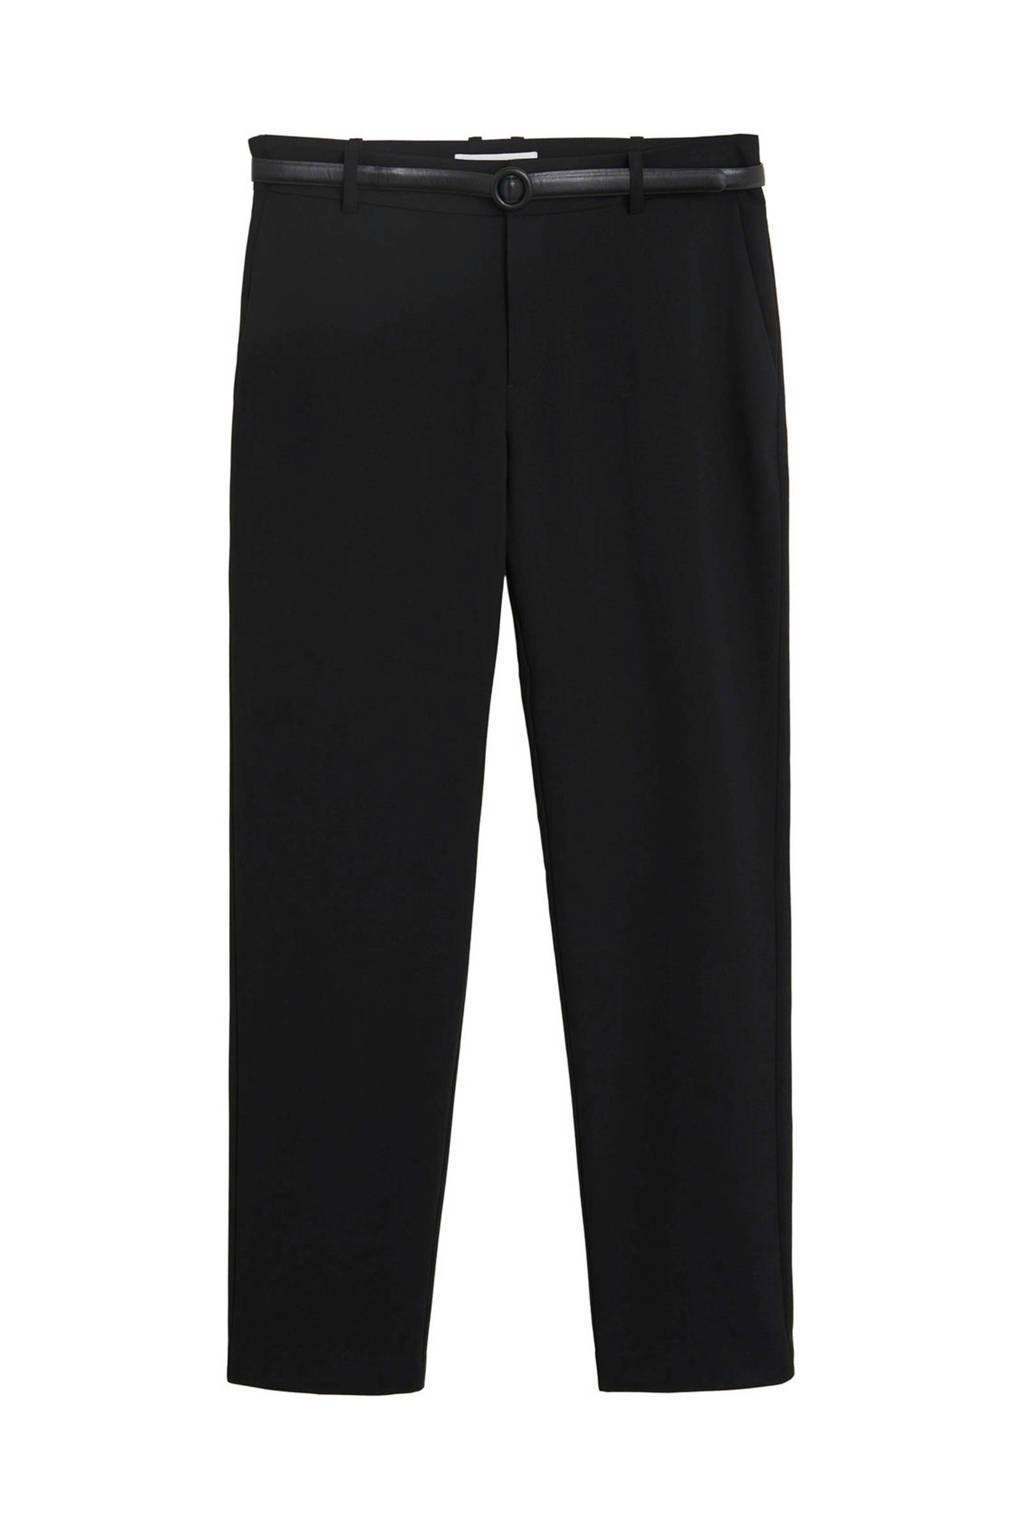 Mango straight fit pantalon zwart, Zwart